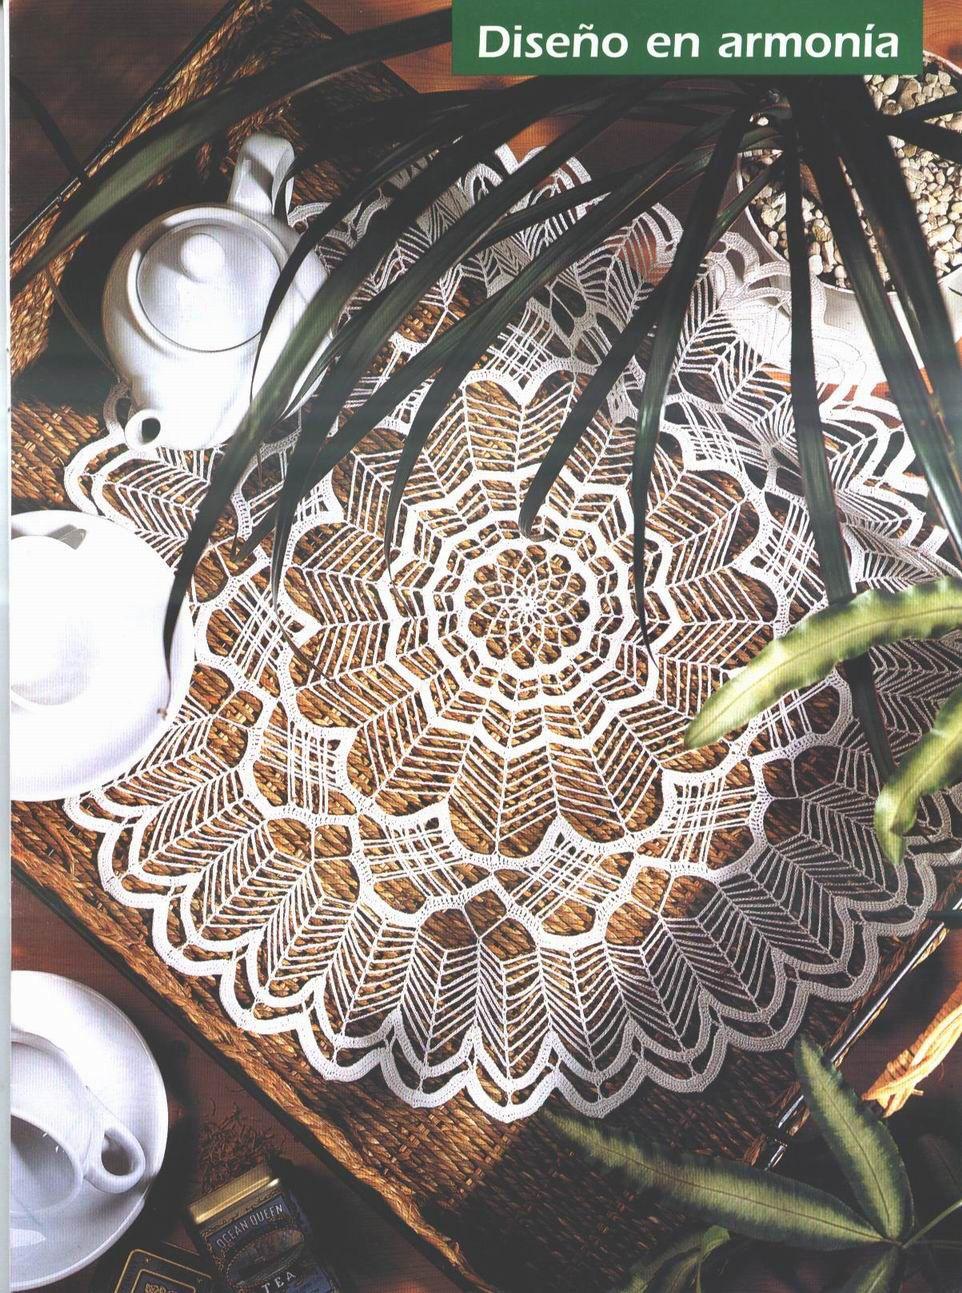 Reminds me of Eagle feathers | Crochet - Doilies | Pinterest ...